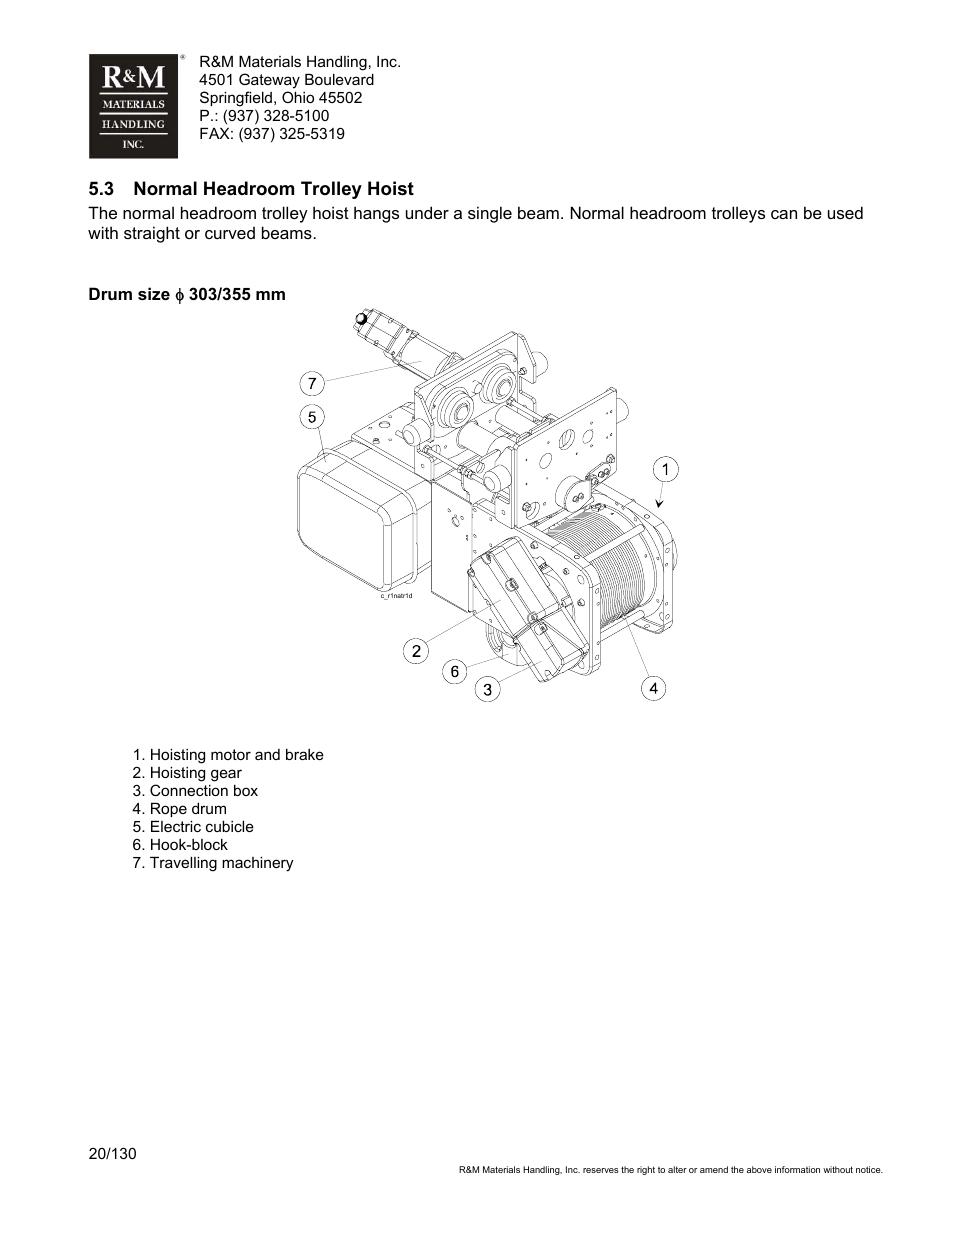 3 normal headroom trolley hoist | R&M Materials Handling WIRE ROPE ...